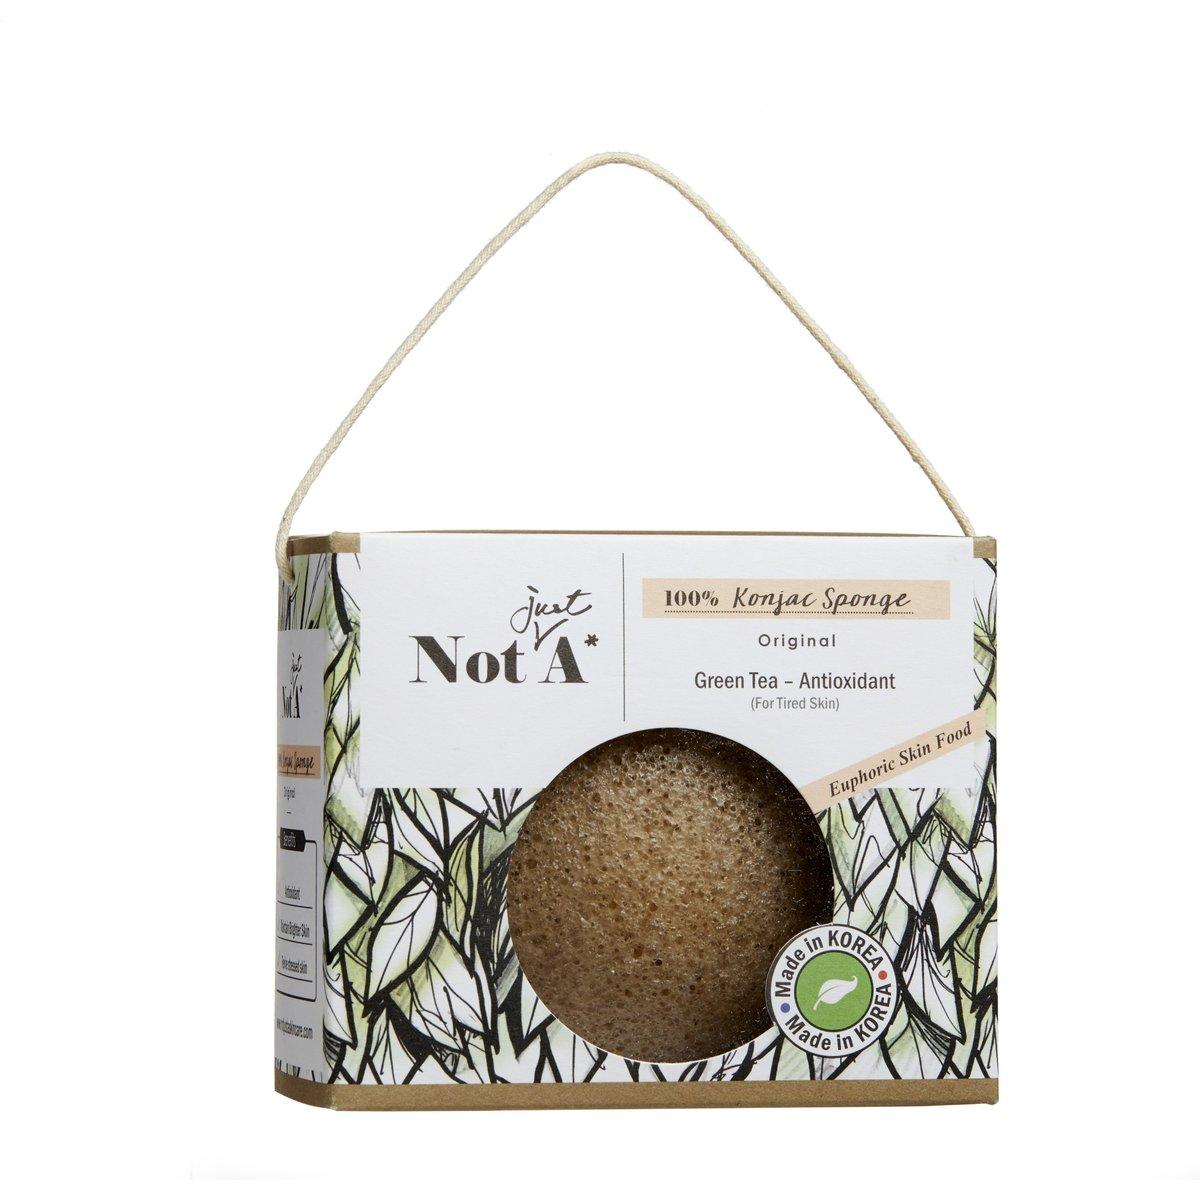 Konjac Face Sponge - Green Tea - Antioxidant